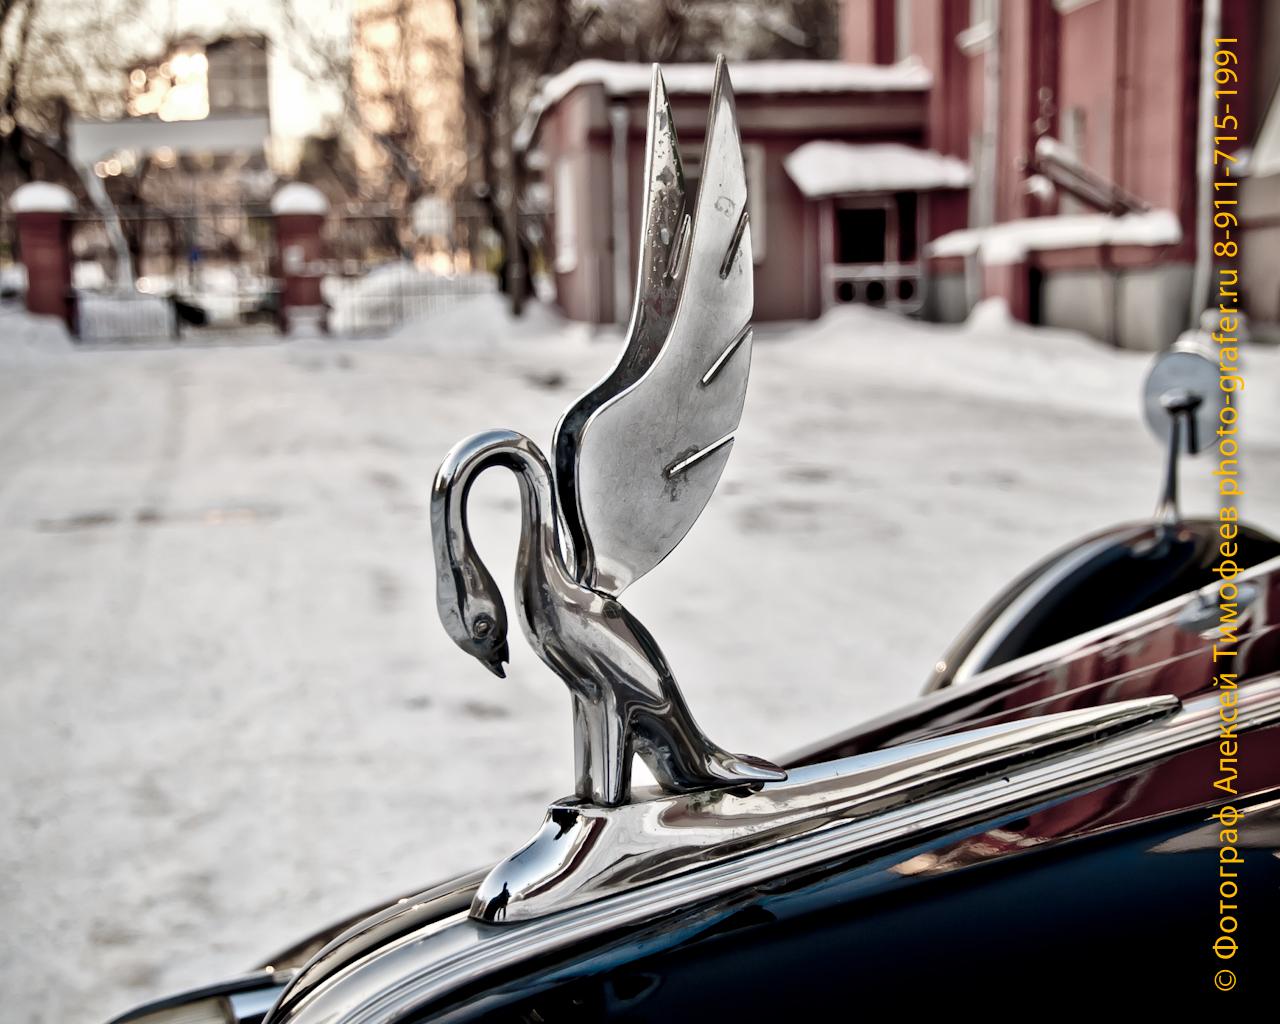 Из Архивов фотографа: Packard Super Eight 180 1941 (Паккард Супер 8 180 1941)